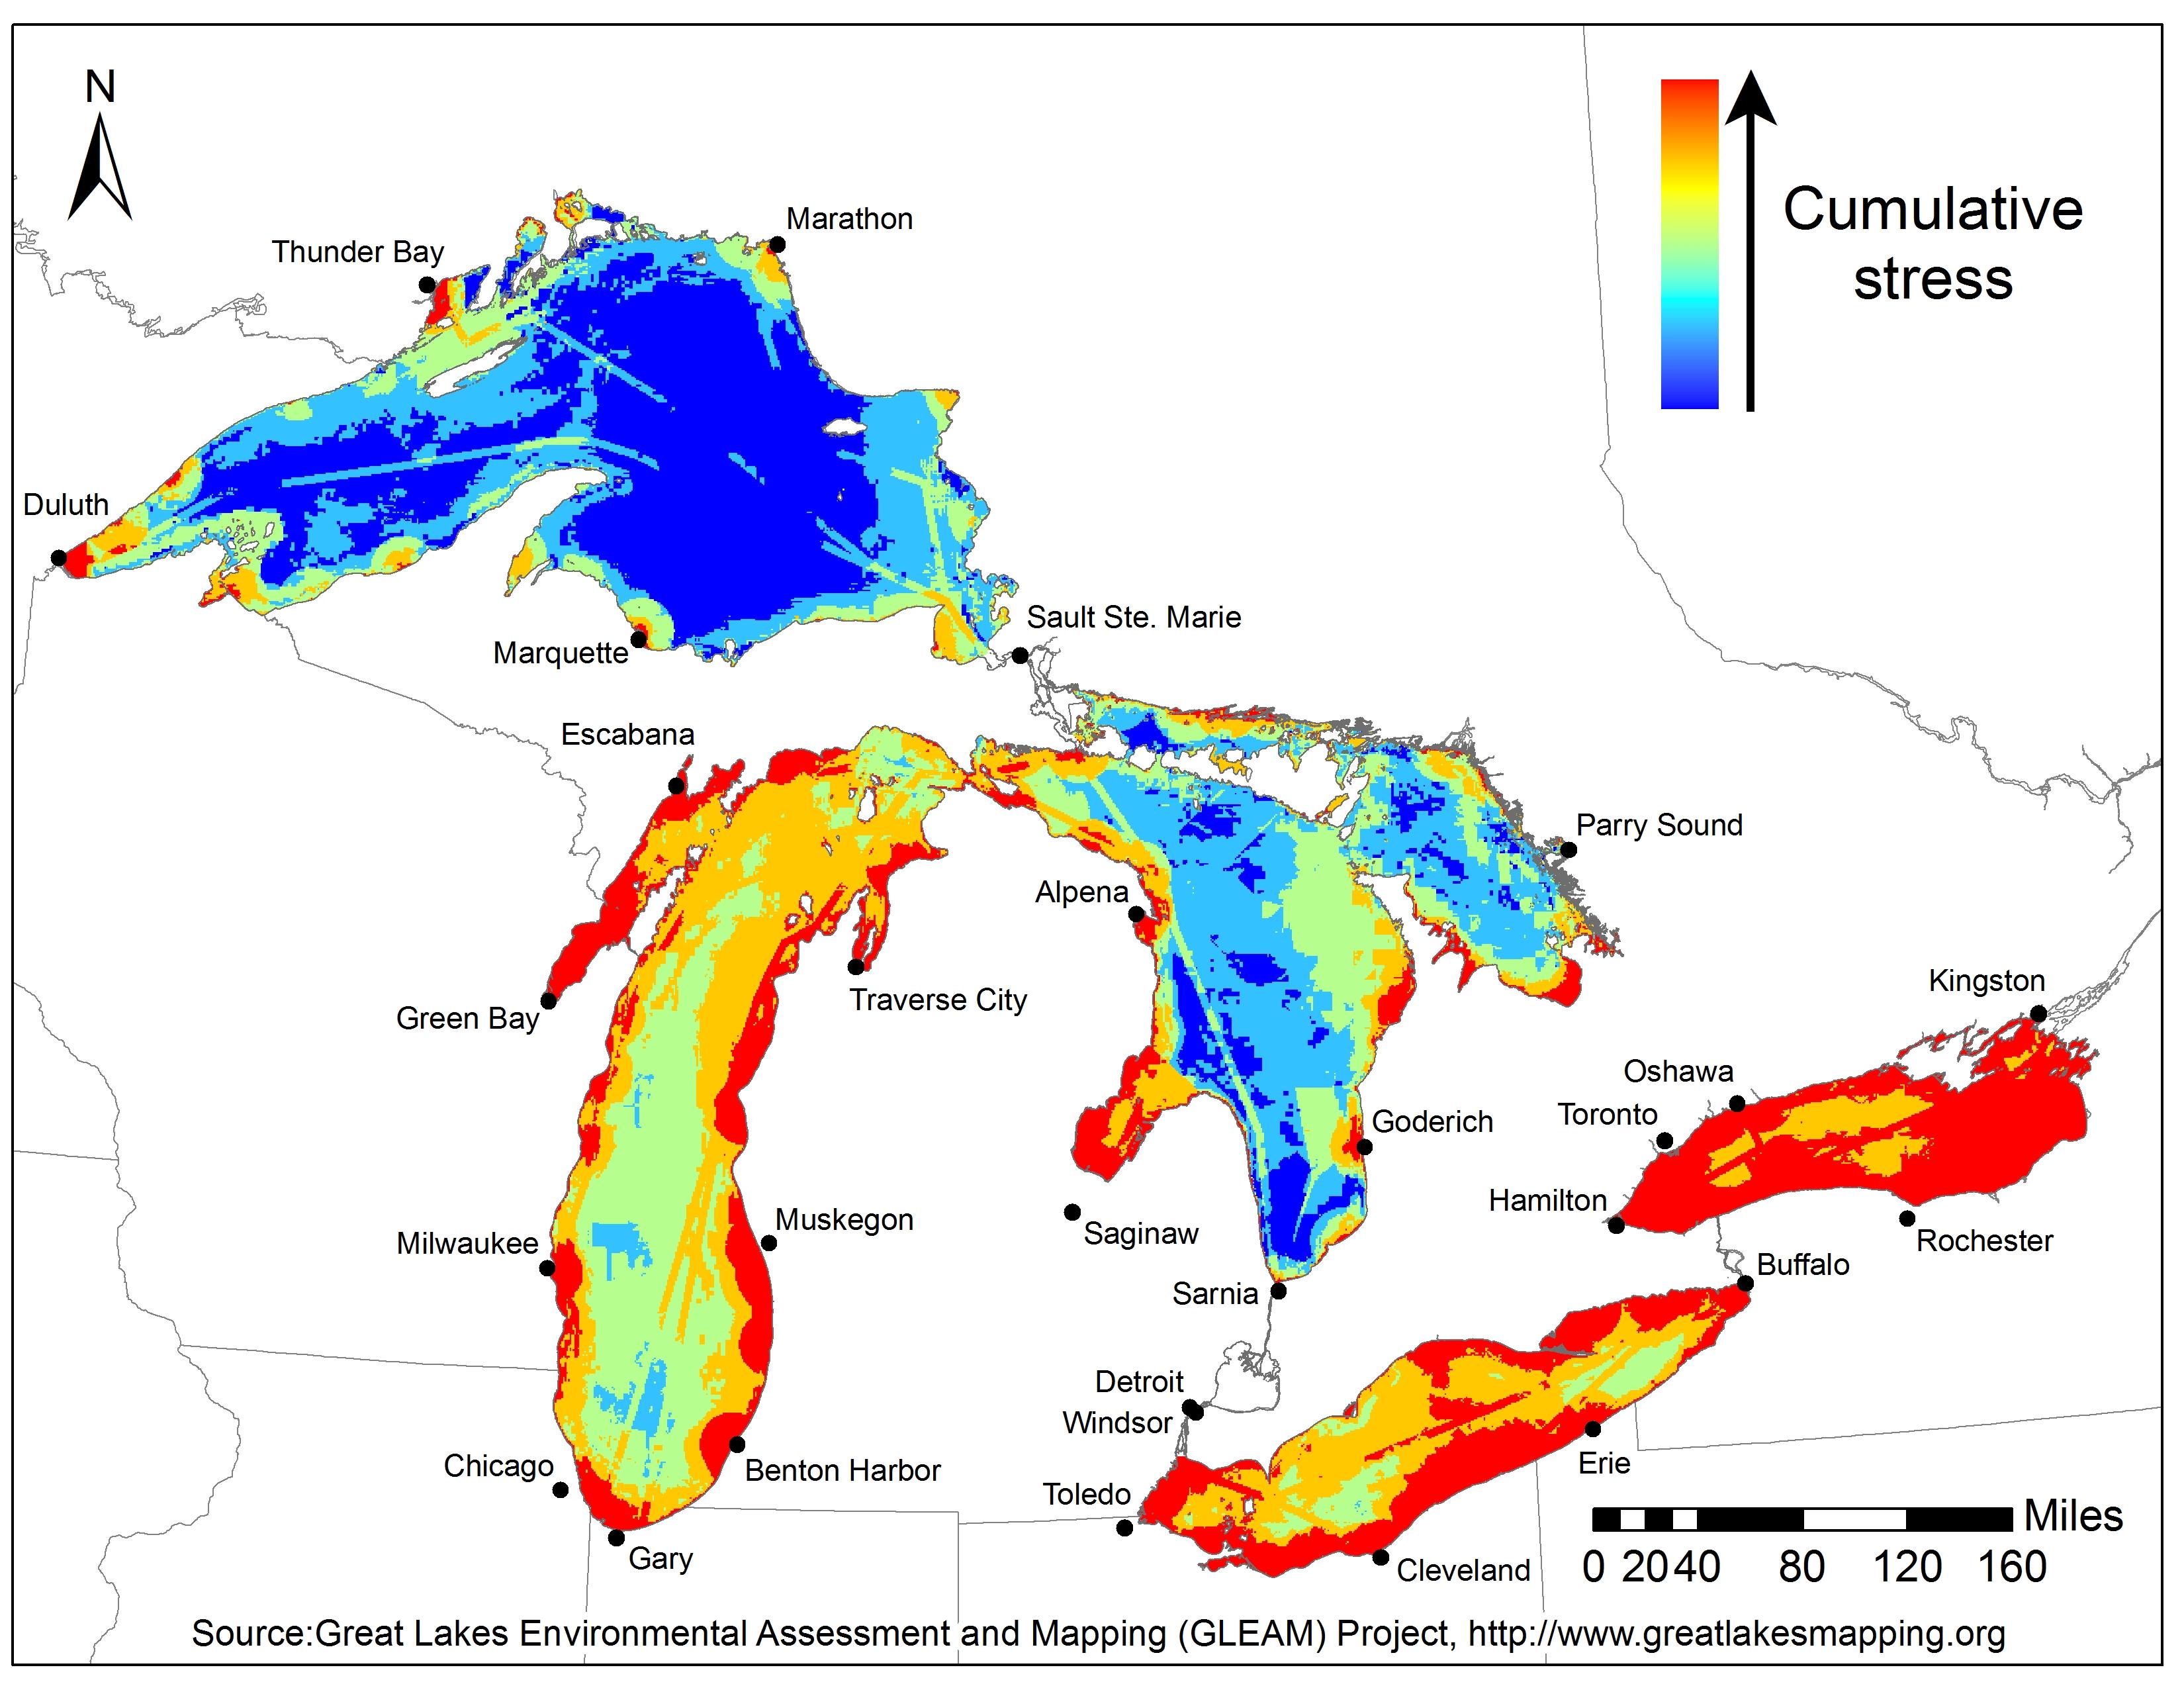 lake erie temperature map Environmental Threat Map Highlights Great Lakes Restoration Challenges lake erie temperature map